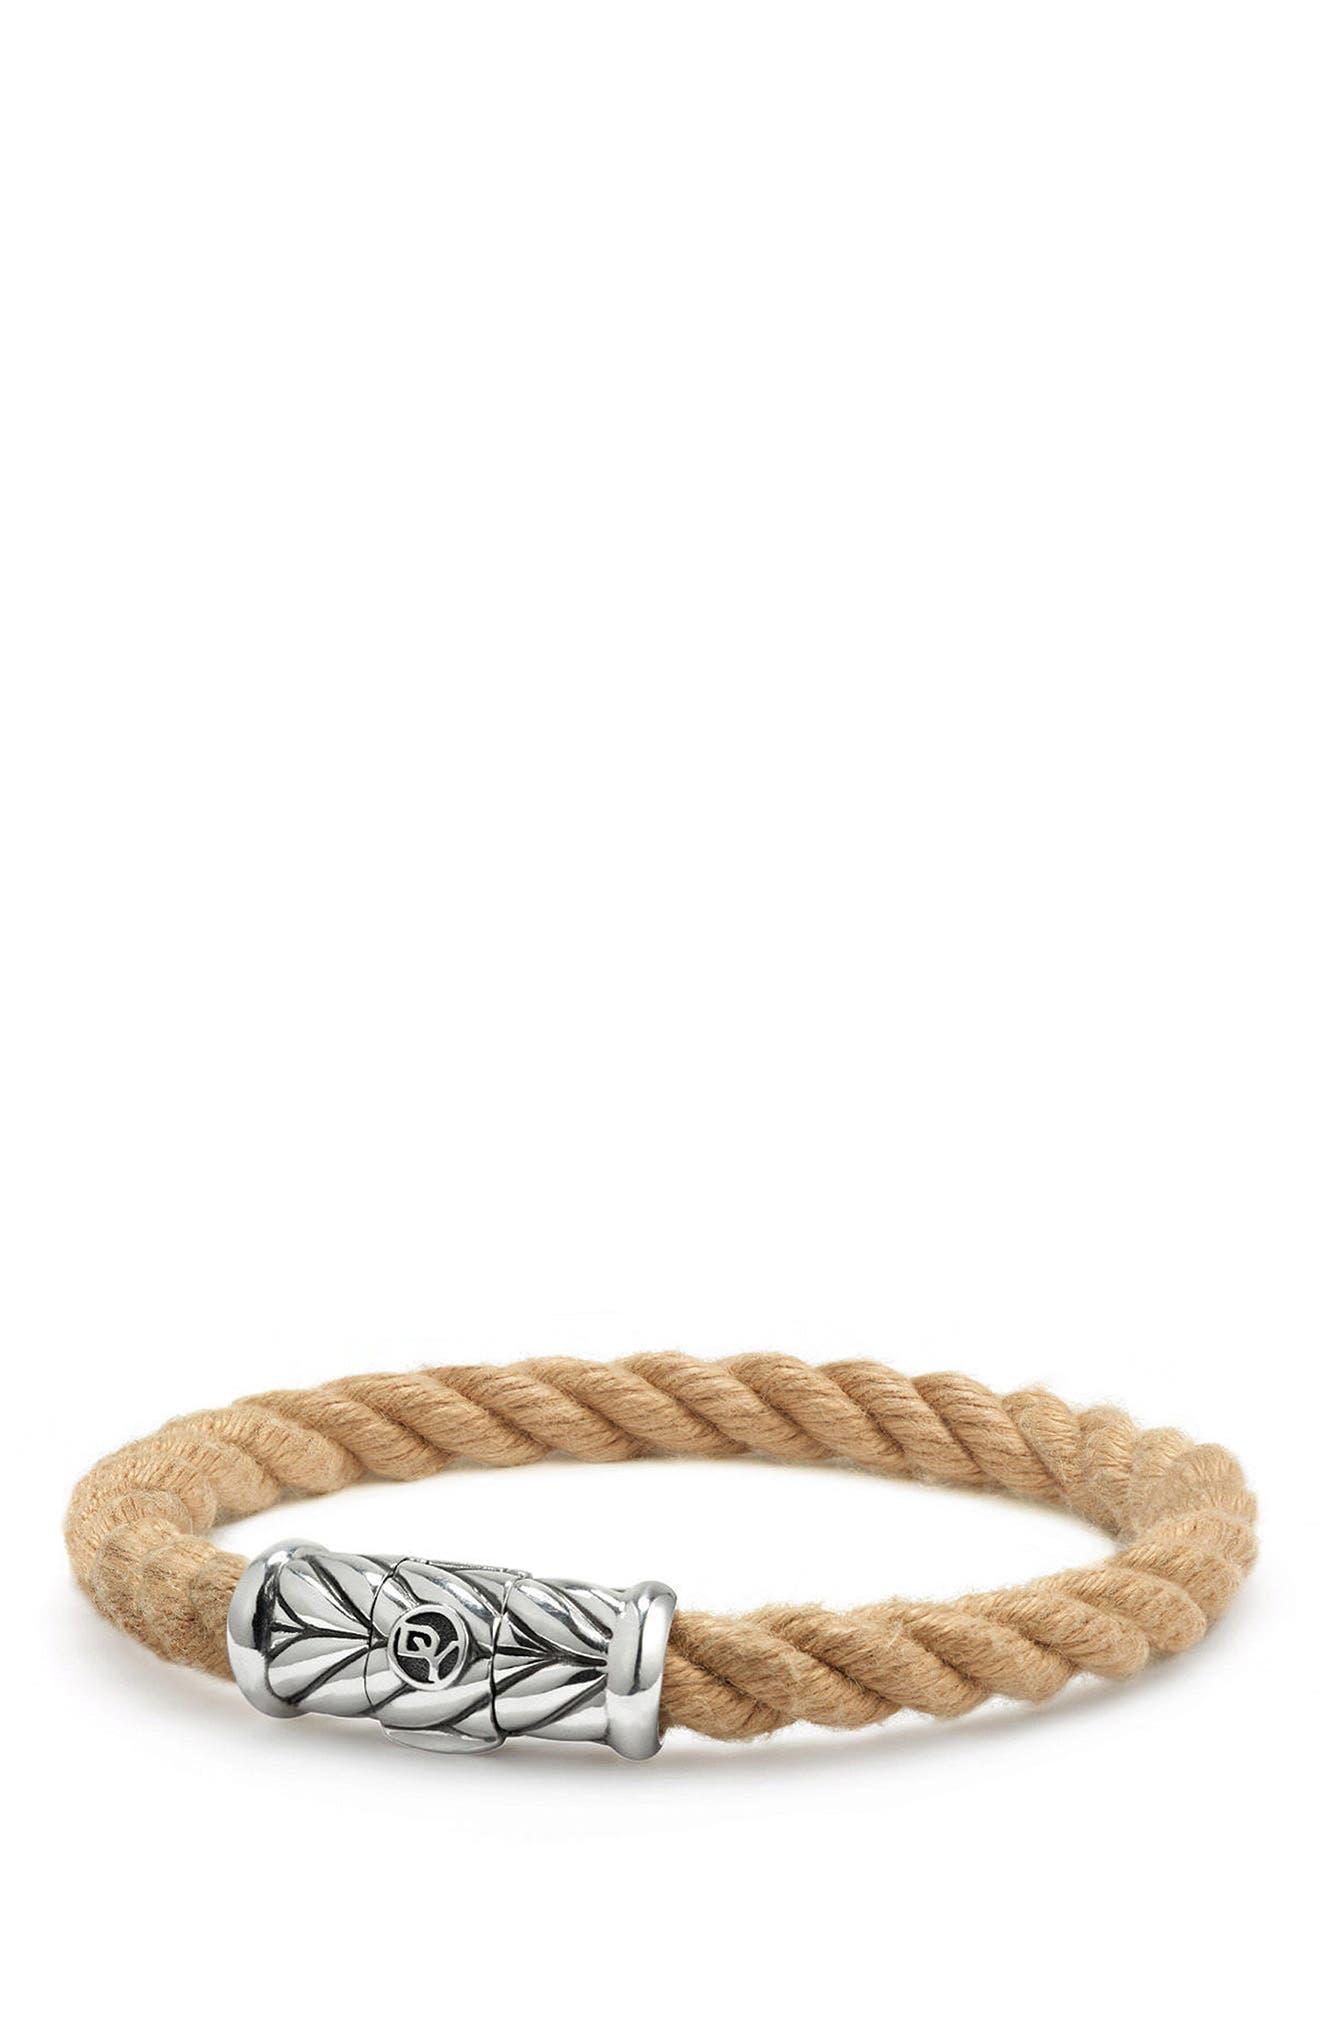 Maritime Rope Bracelet,                         Main,                         color, Silver